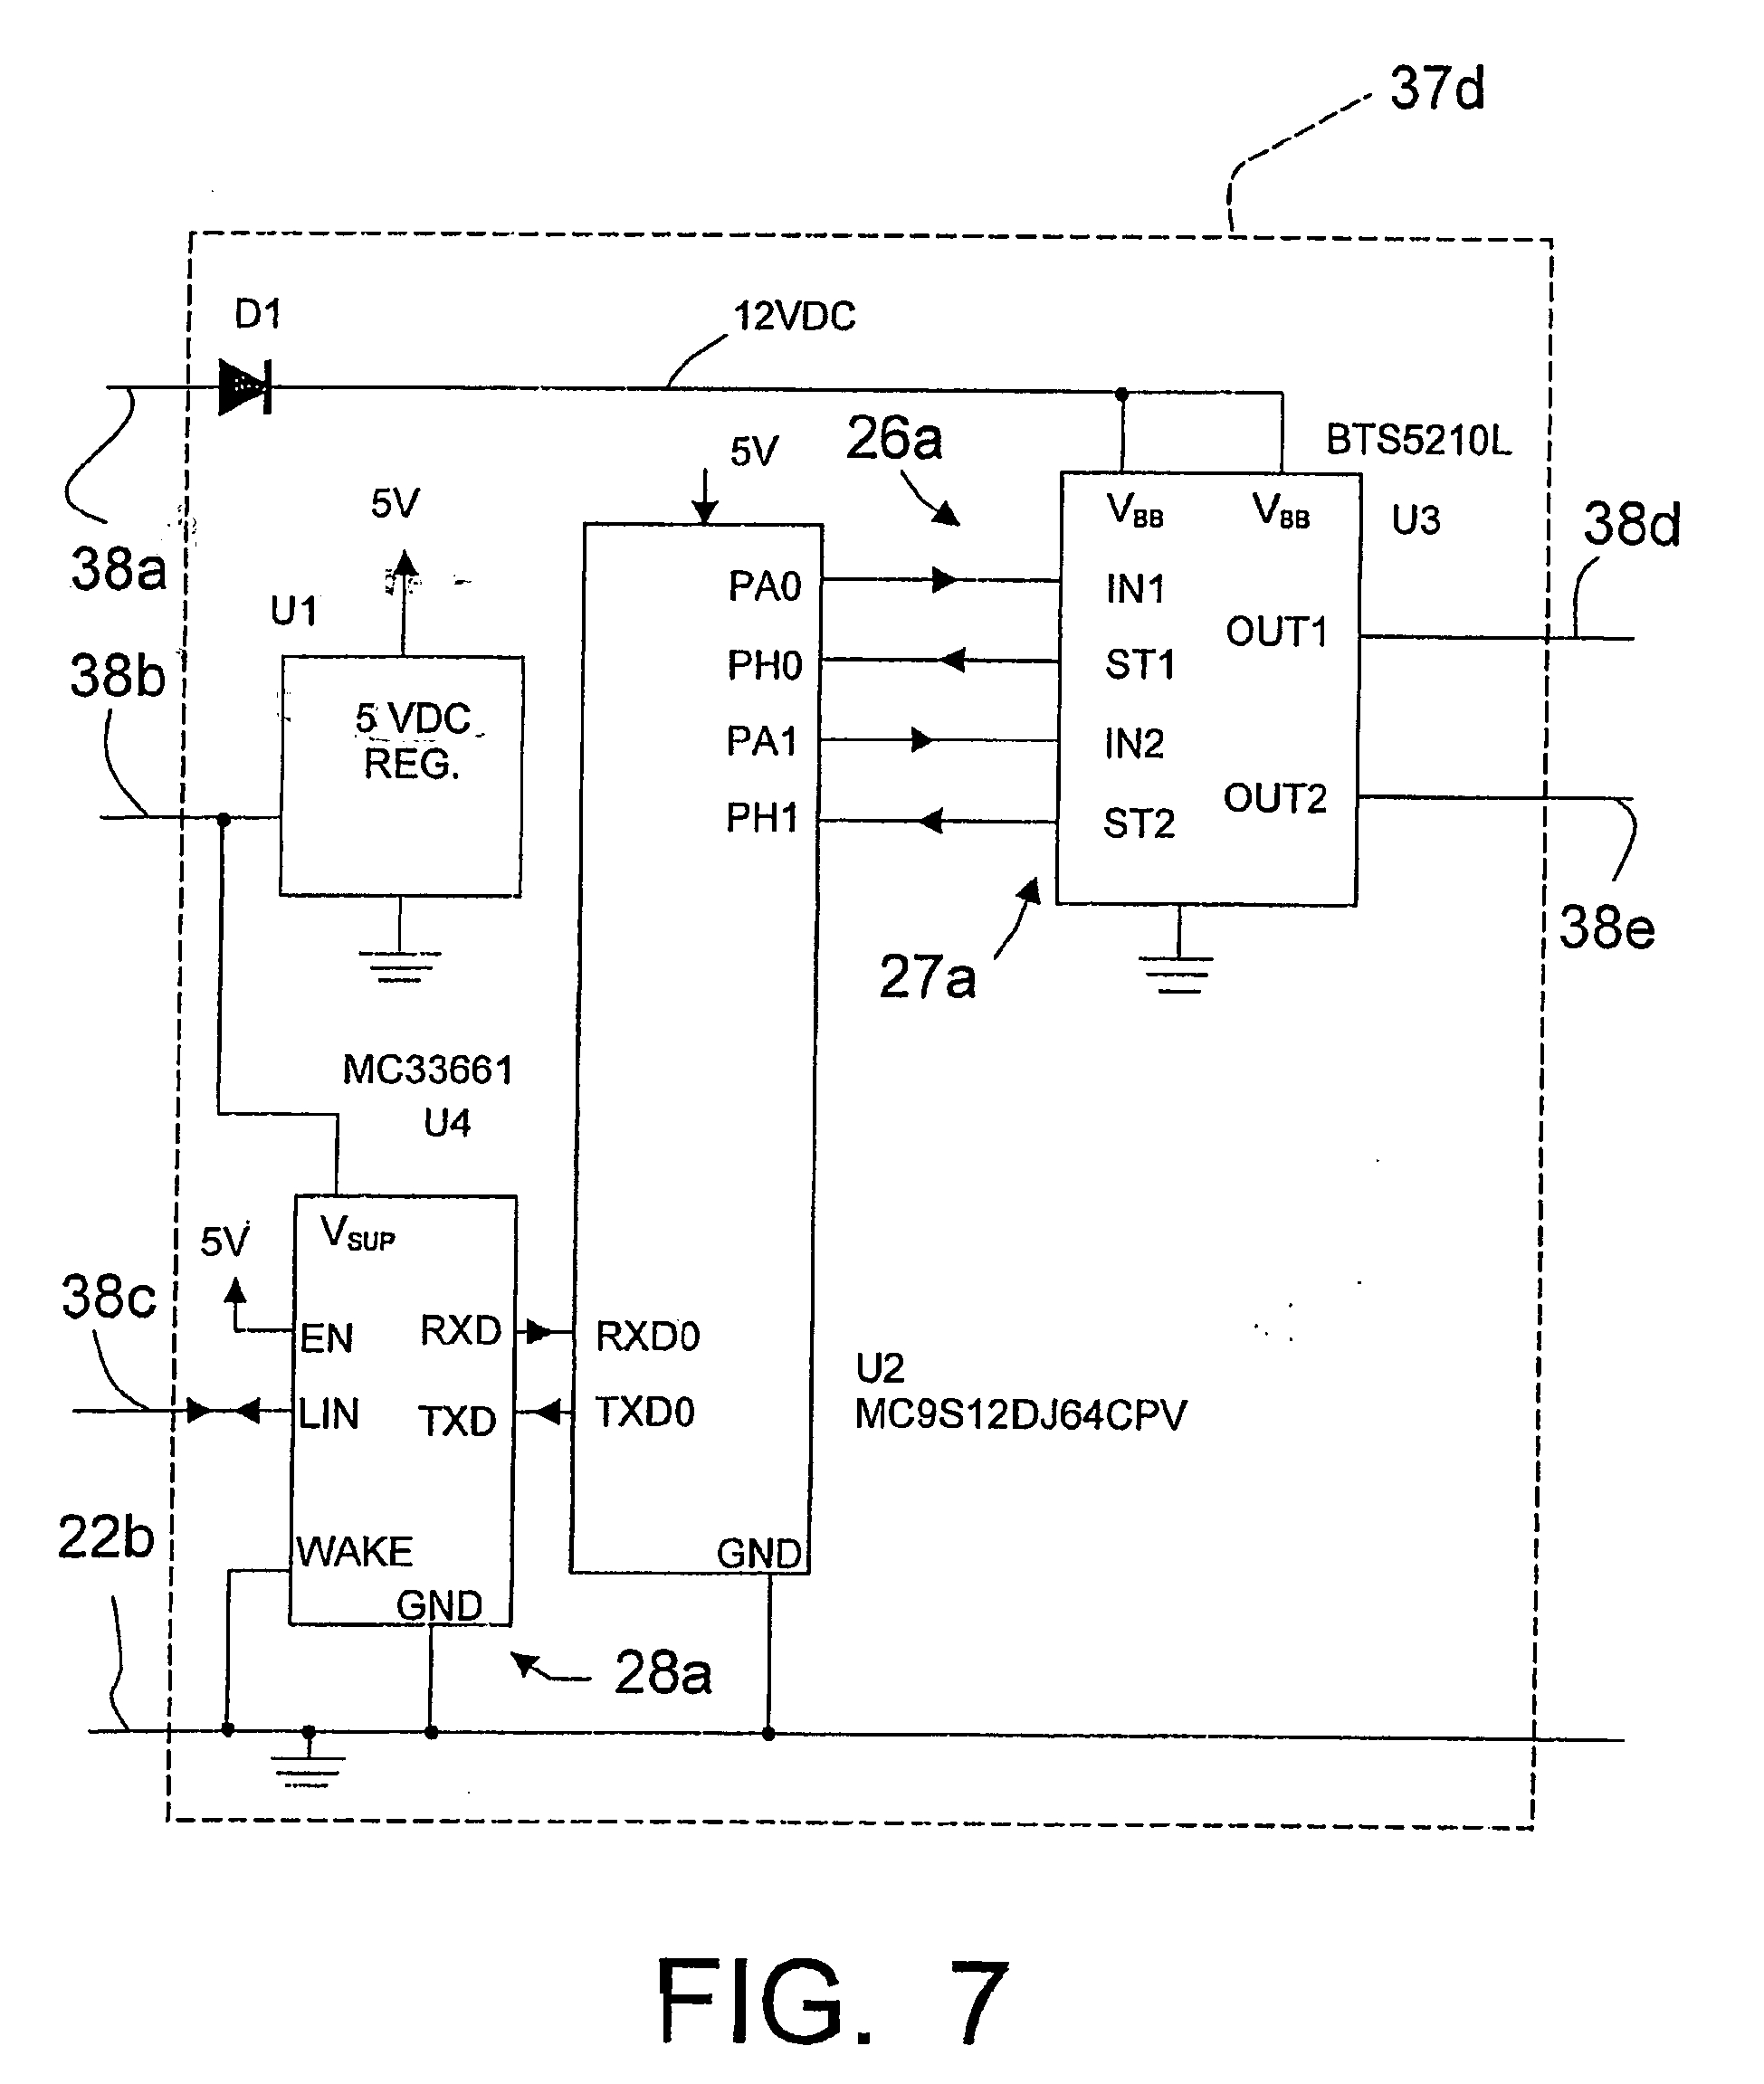 haldex abs wiring diagram 1 exclusive hookah de \u2022wabco abs wiring diagram schematic diagram rh 36hcvb moralive de truck air brakes diagram truck air